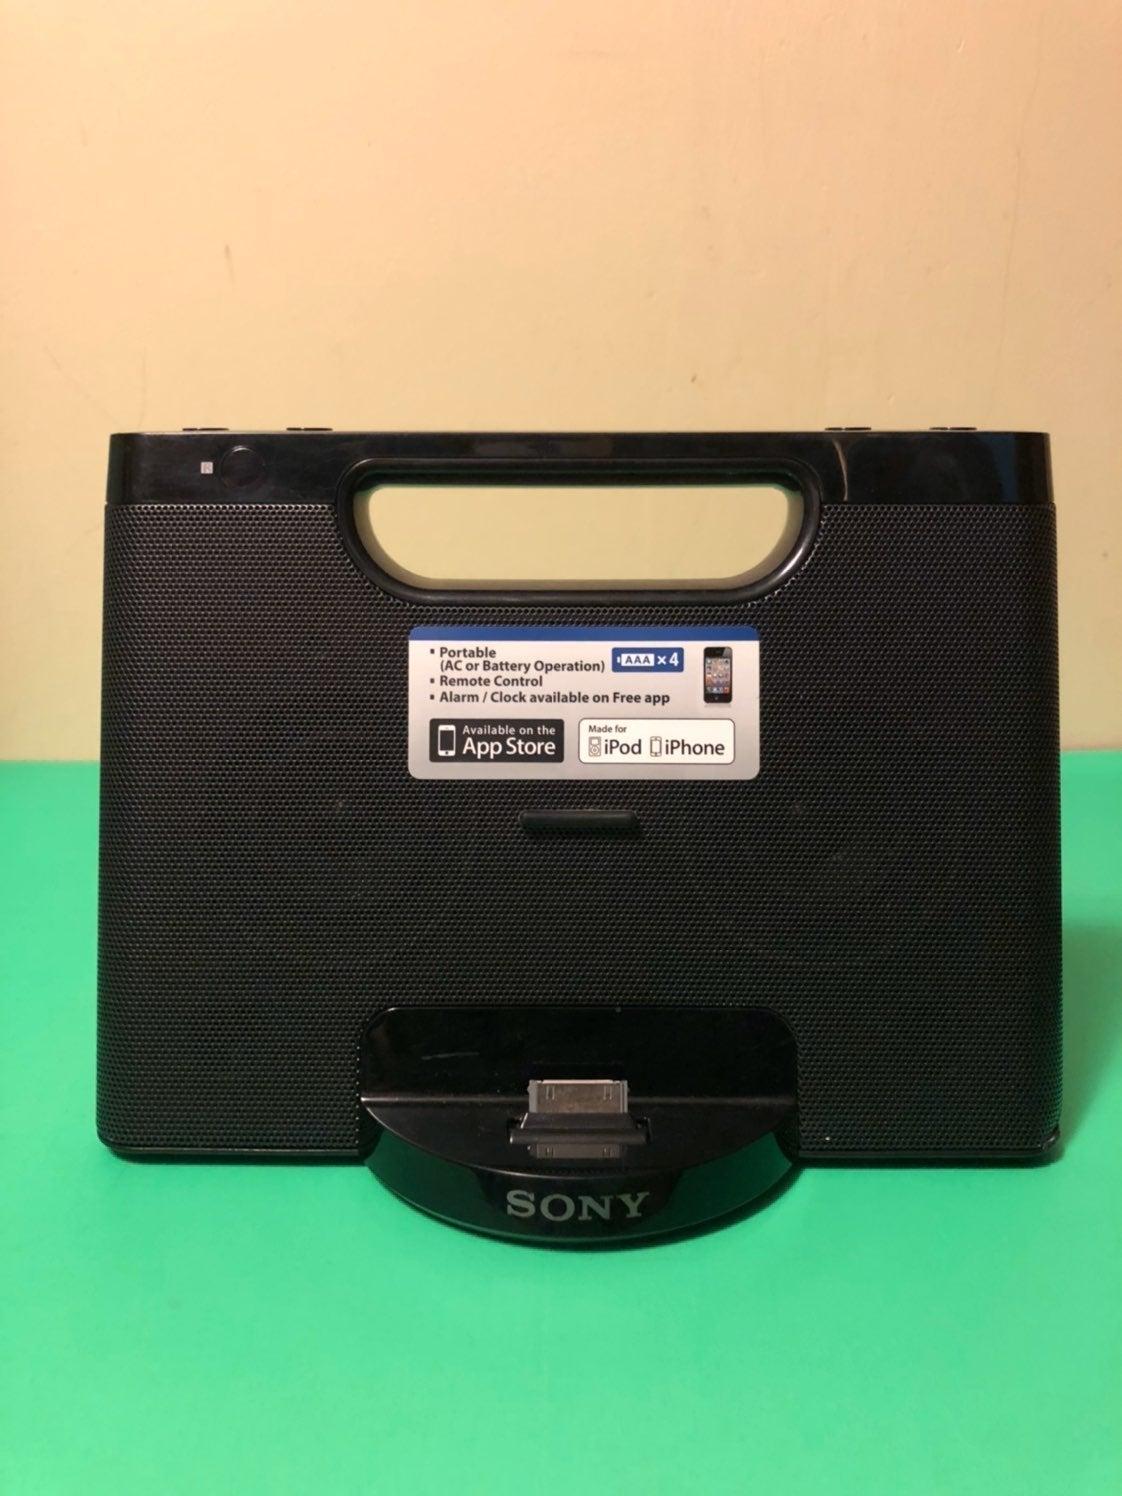 Sony RDP-M7iPN Lightning iPhone/iPod